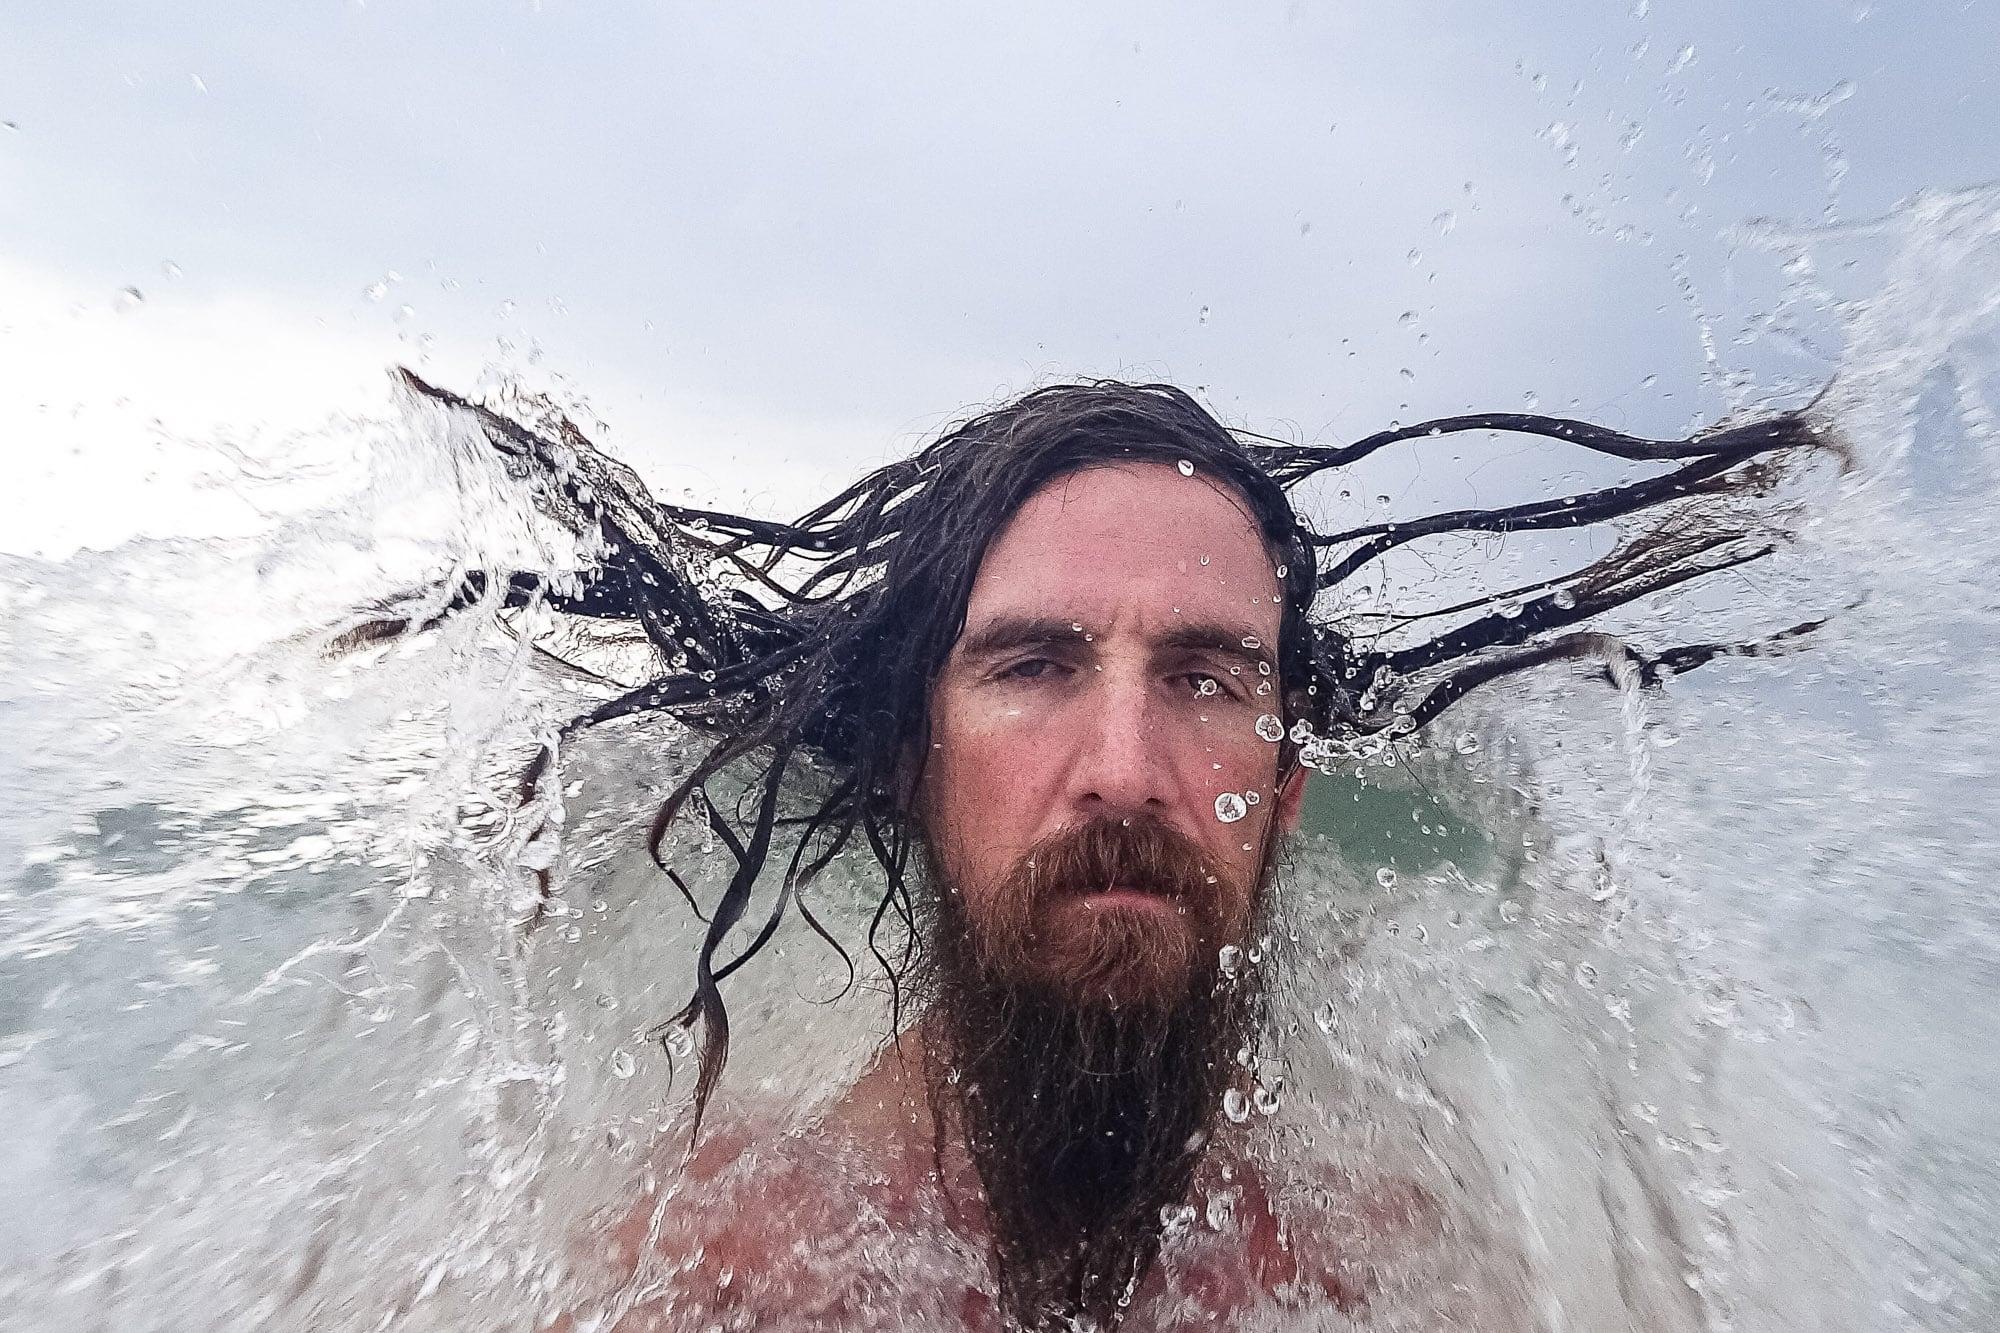 wave selfie 8